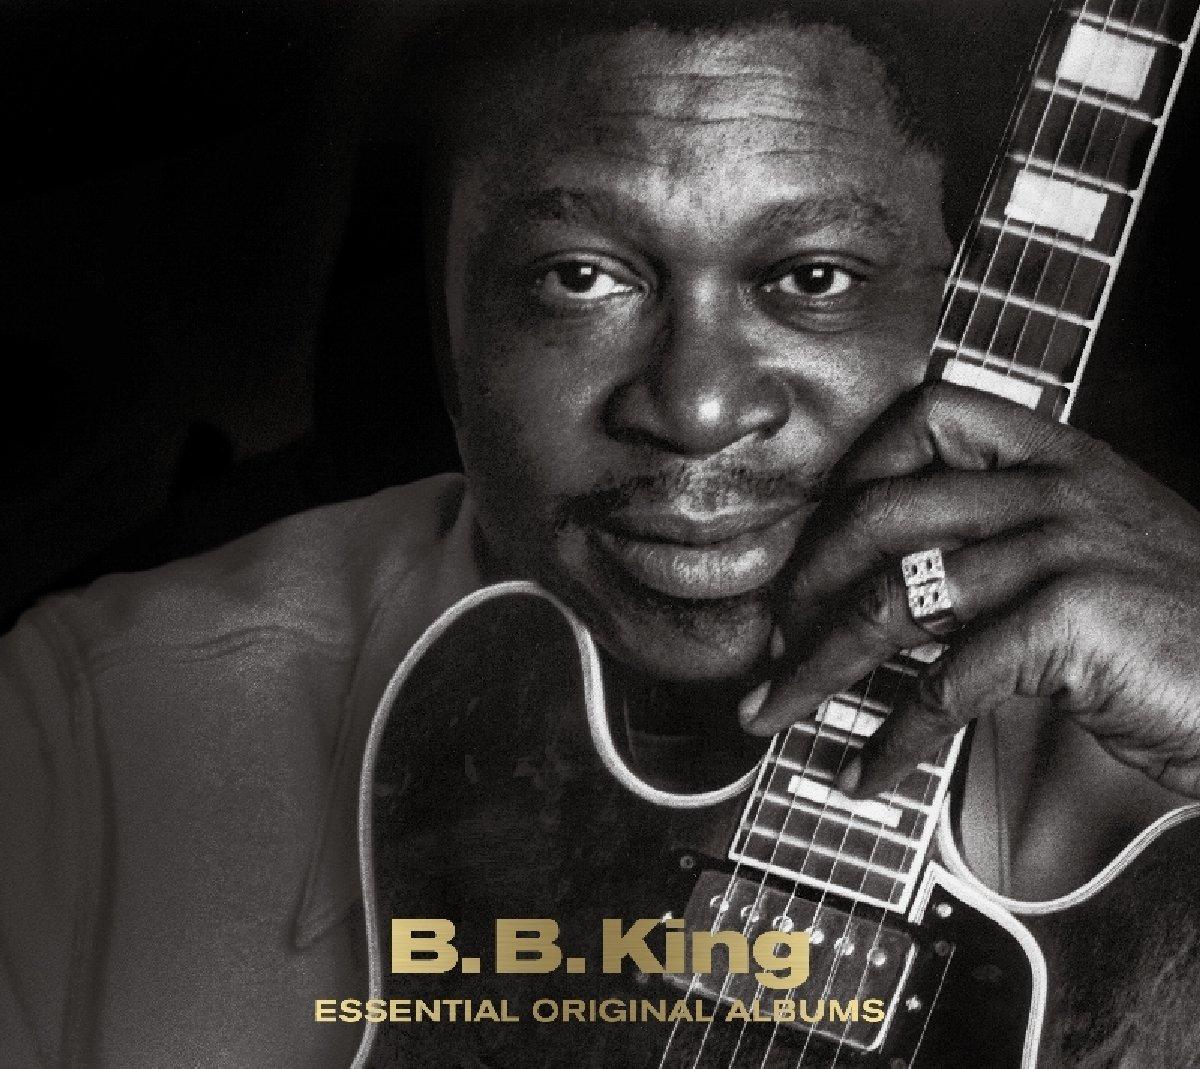 Essential Original Albums - B.B. King by Masters of Music